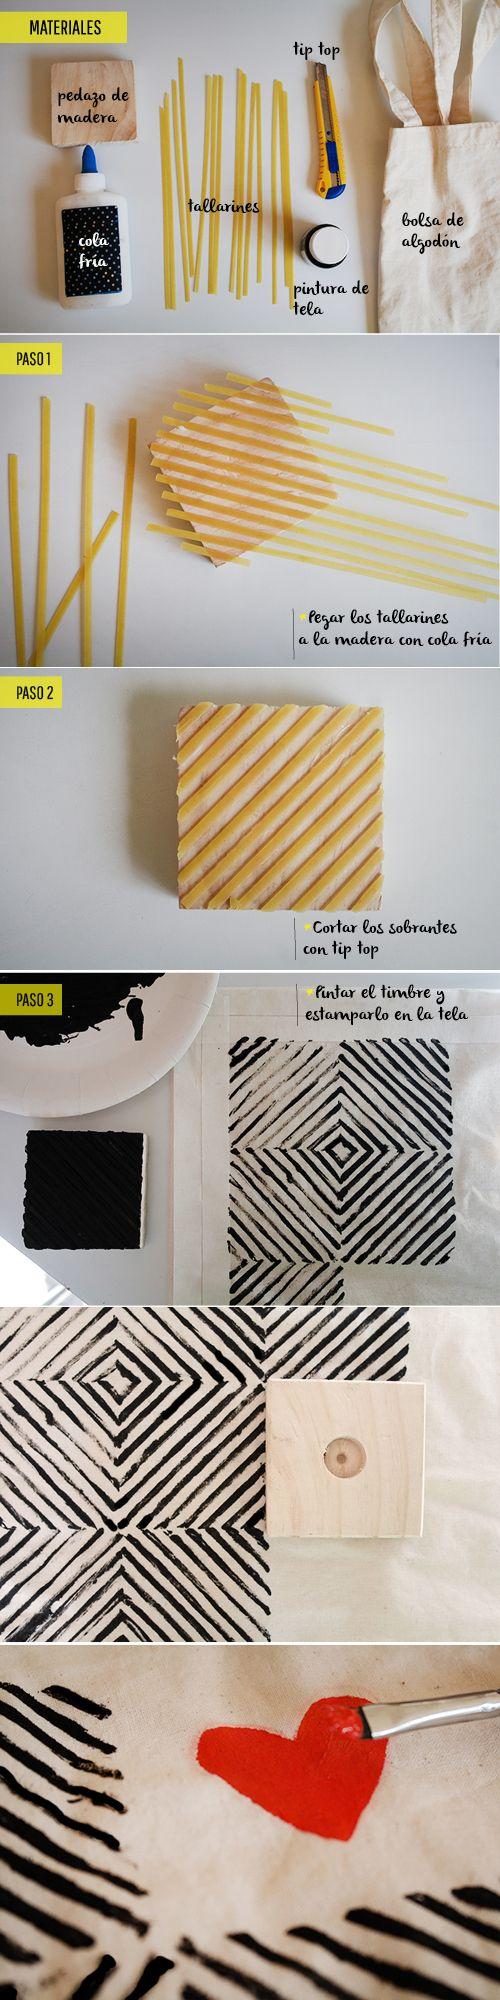 10+ Con que pegar tela en madera ideas in 2021